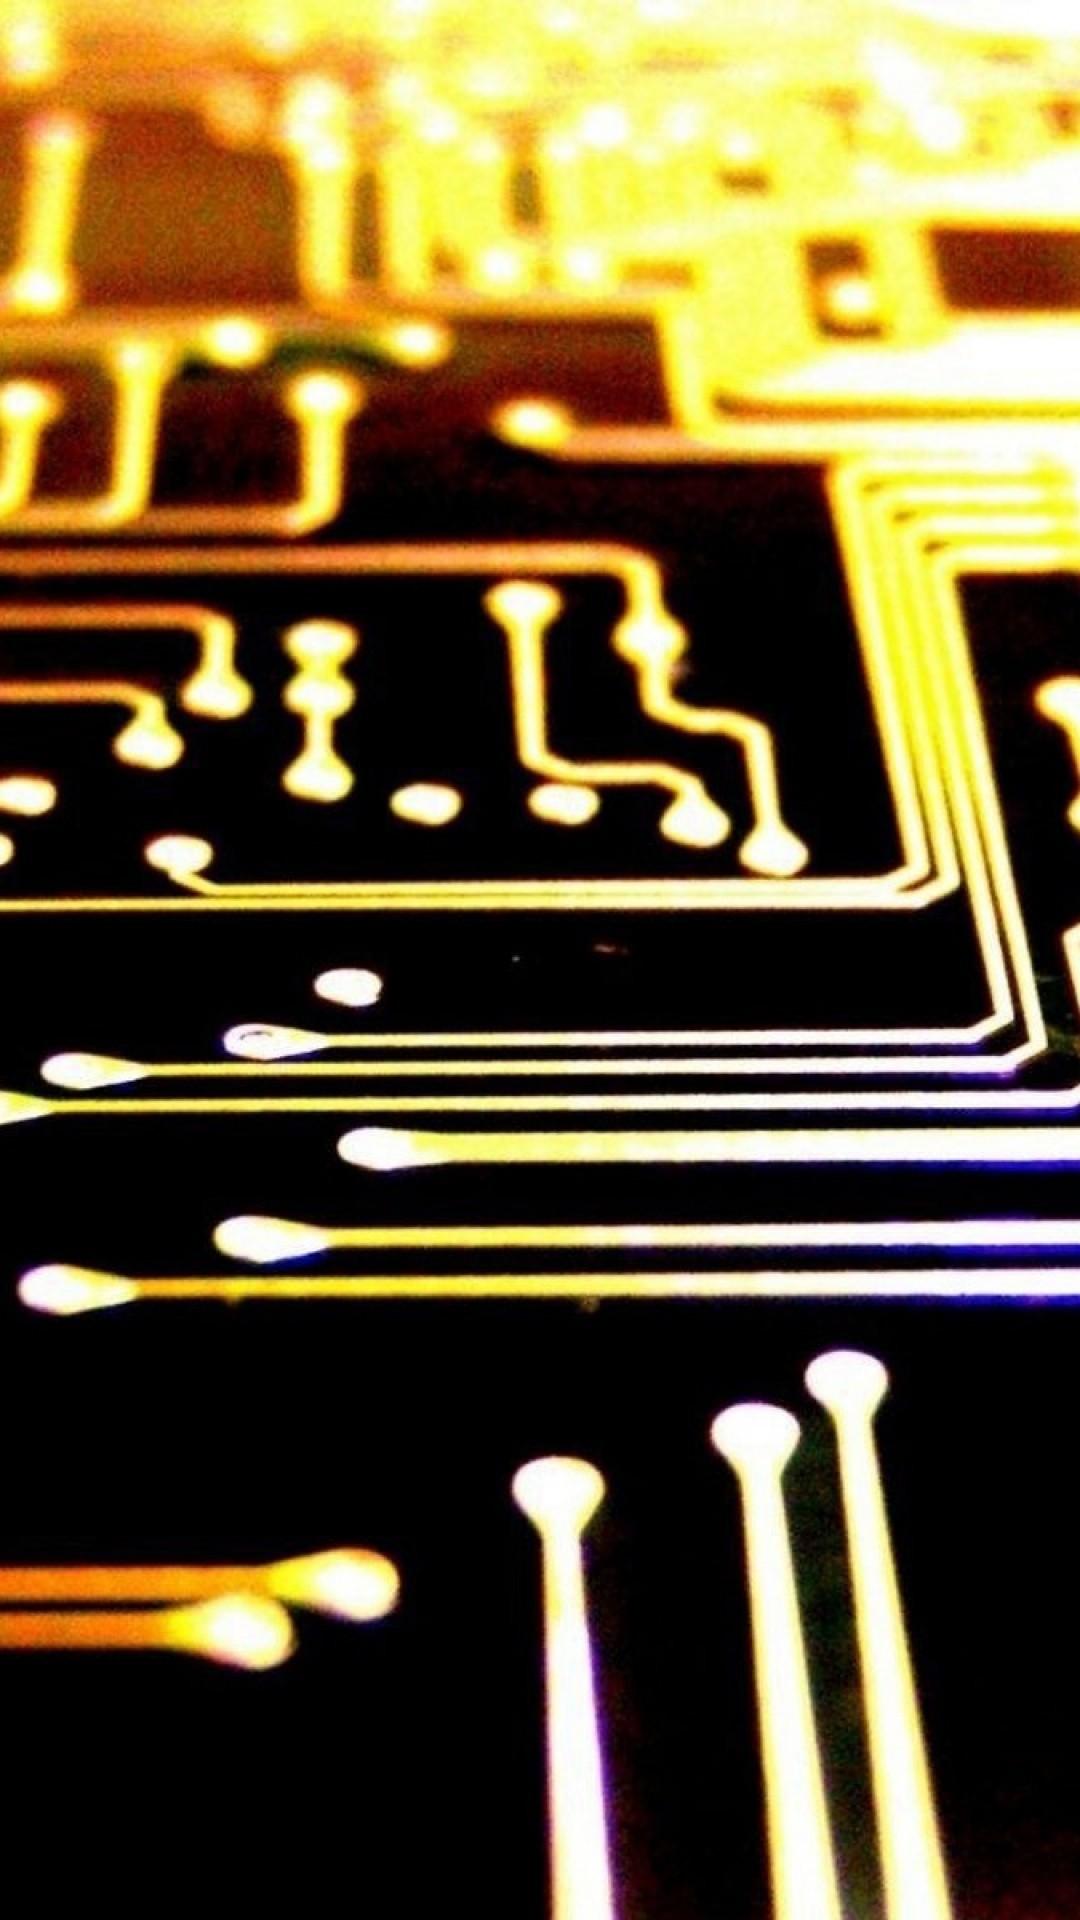 Printed Circuit Board Lockscreen iPhone 6 Plus HD Wallpaper …